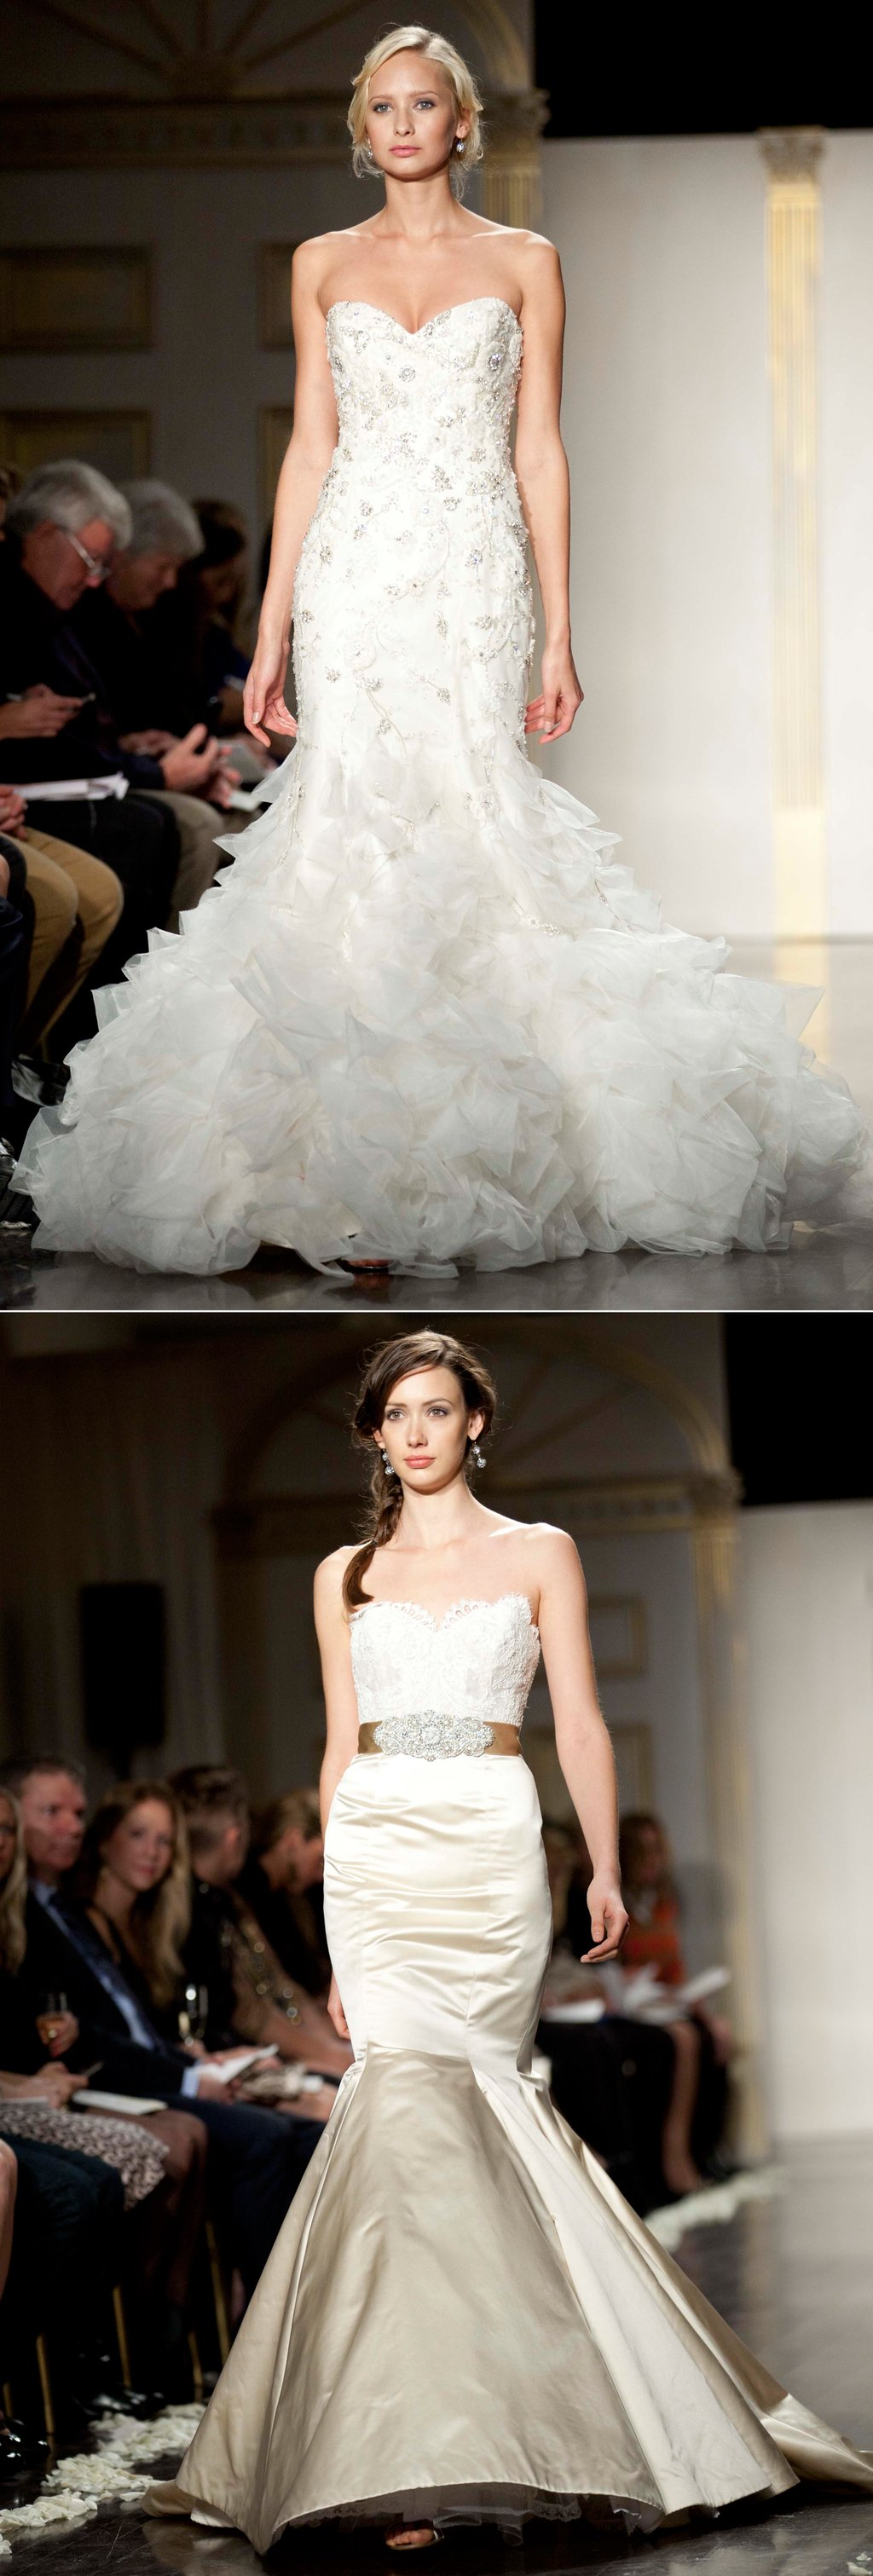 Lazaro-bridal-gowns-2012-wedding-dresses.full